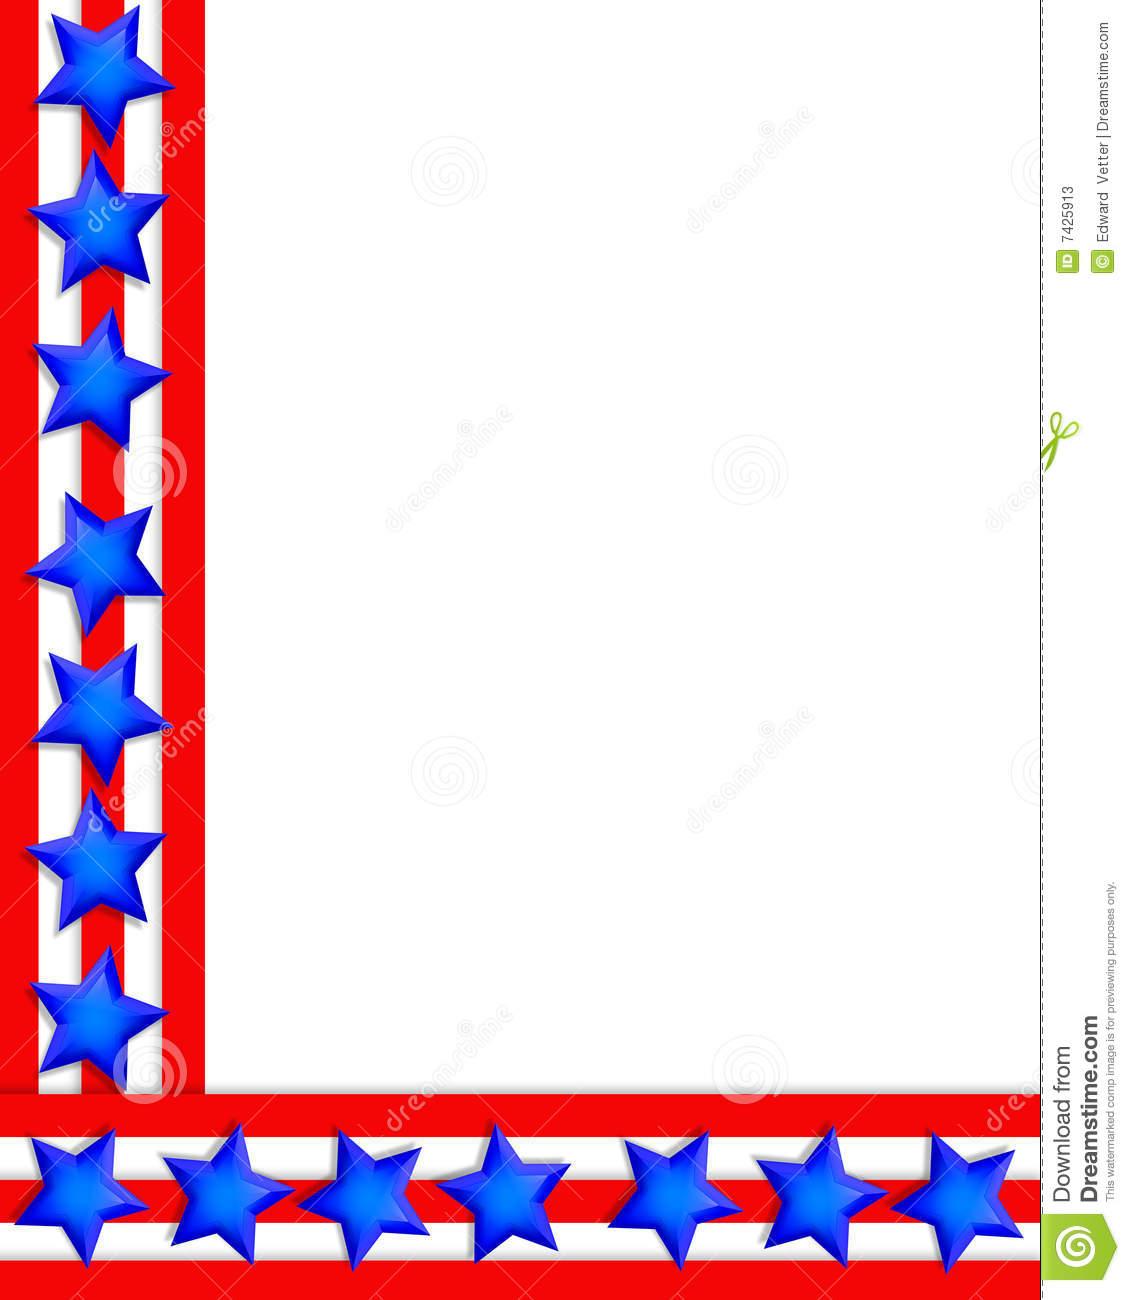 Free download Pin Stars And Stripes Border Clip Art.